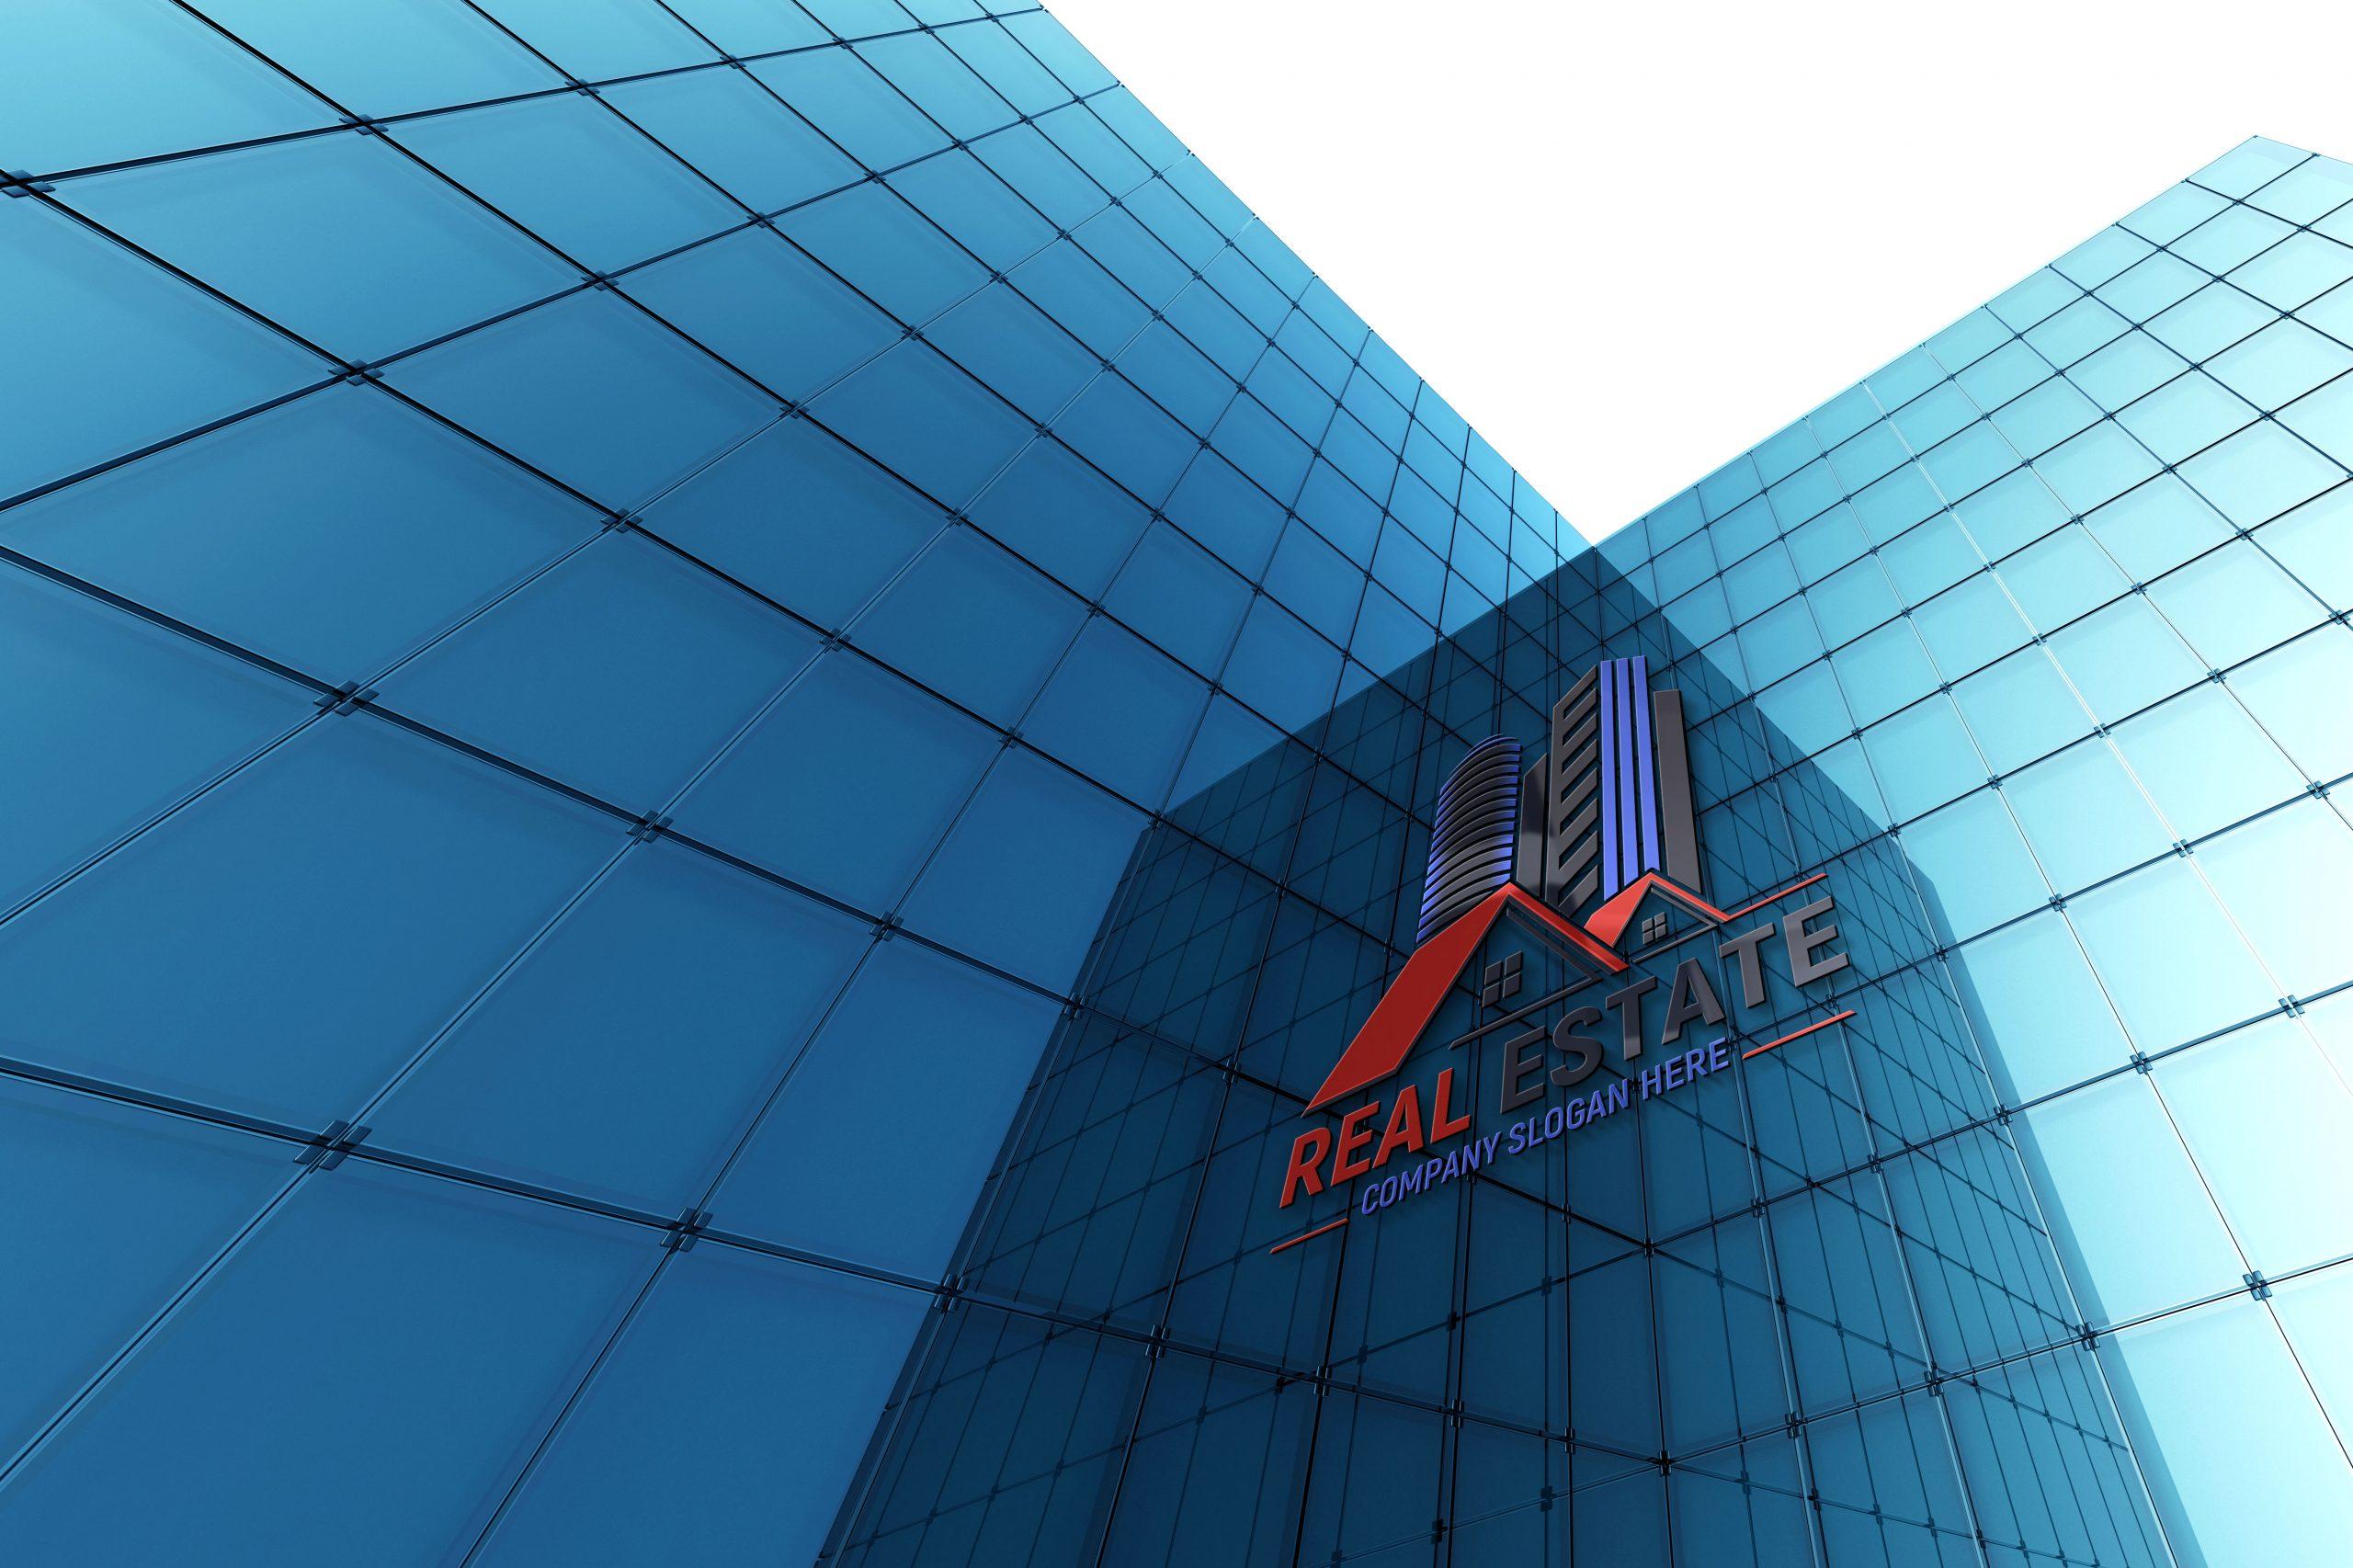 Photoshop Editable Real Estate Logo Design